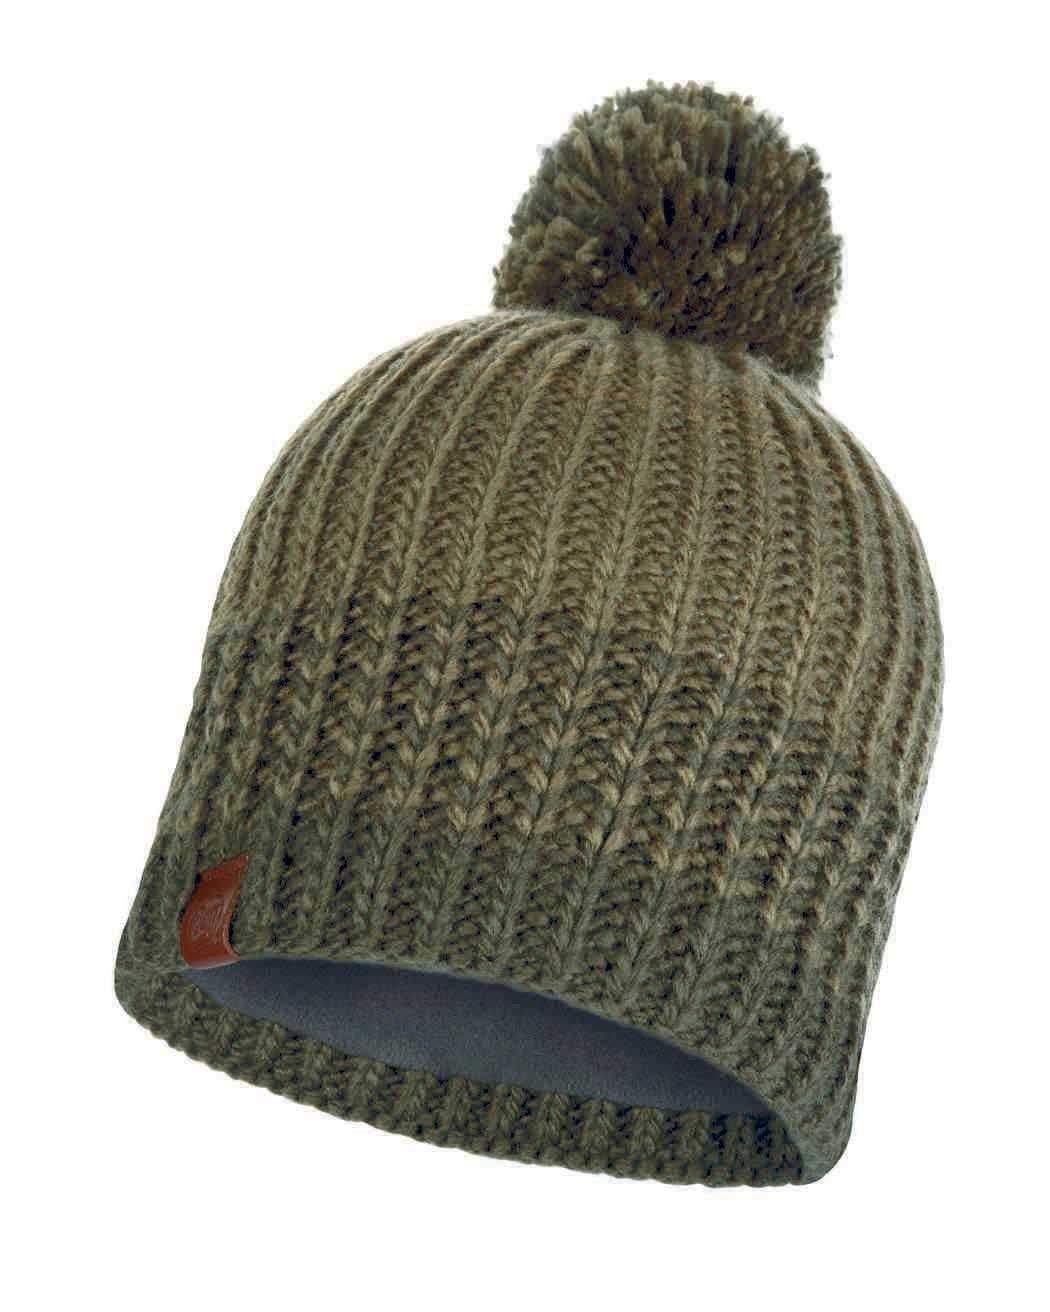 Шапки с помпоном Вязаная шапка с флисовой подкладкой Buff Hat Knitted Polar Borae Khaki 116040.854.10.00.jpg